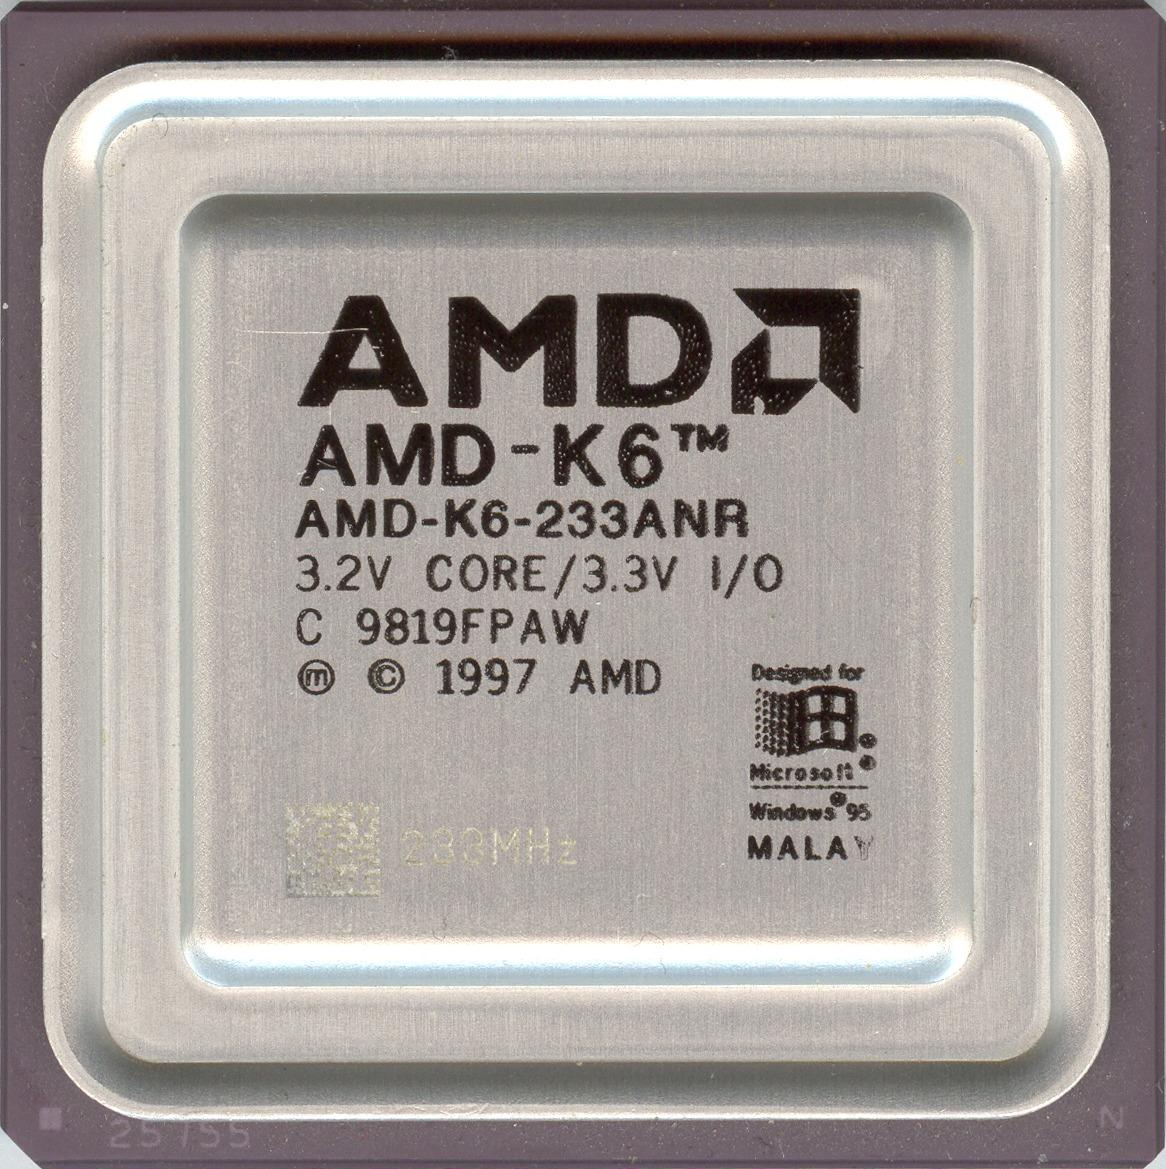 AMD K6 233 - Hardware museum